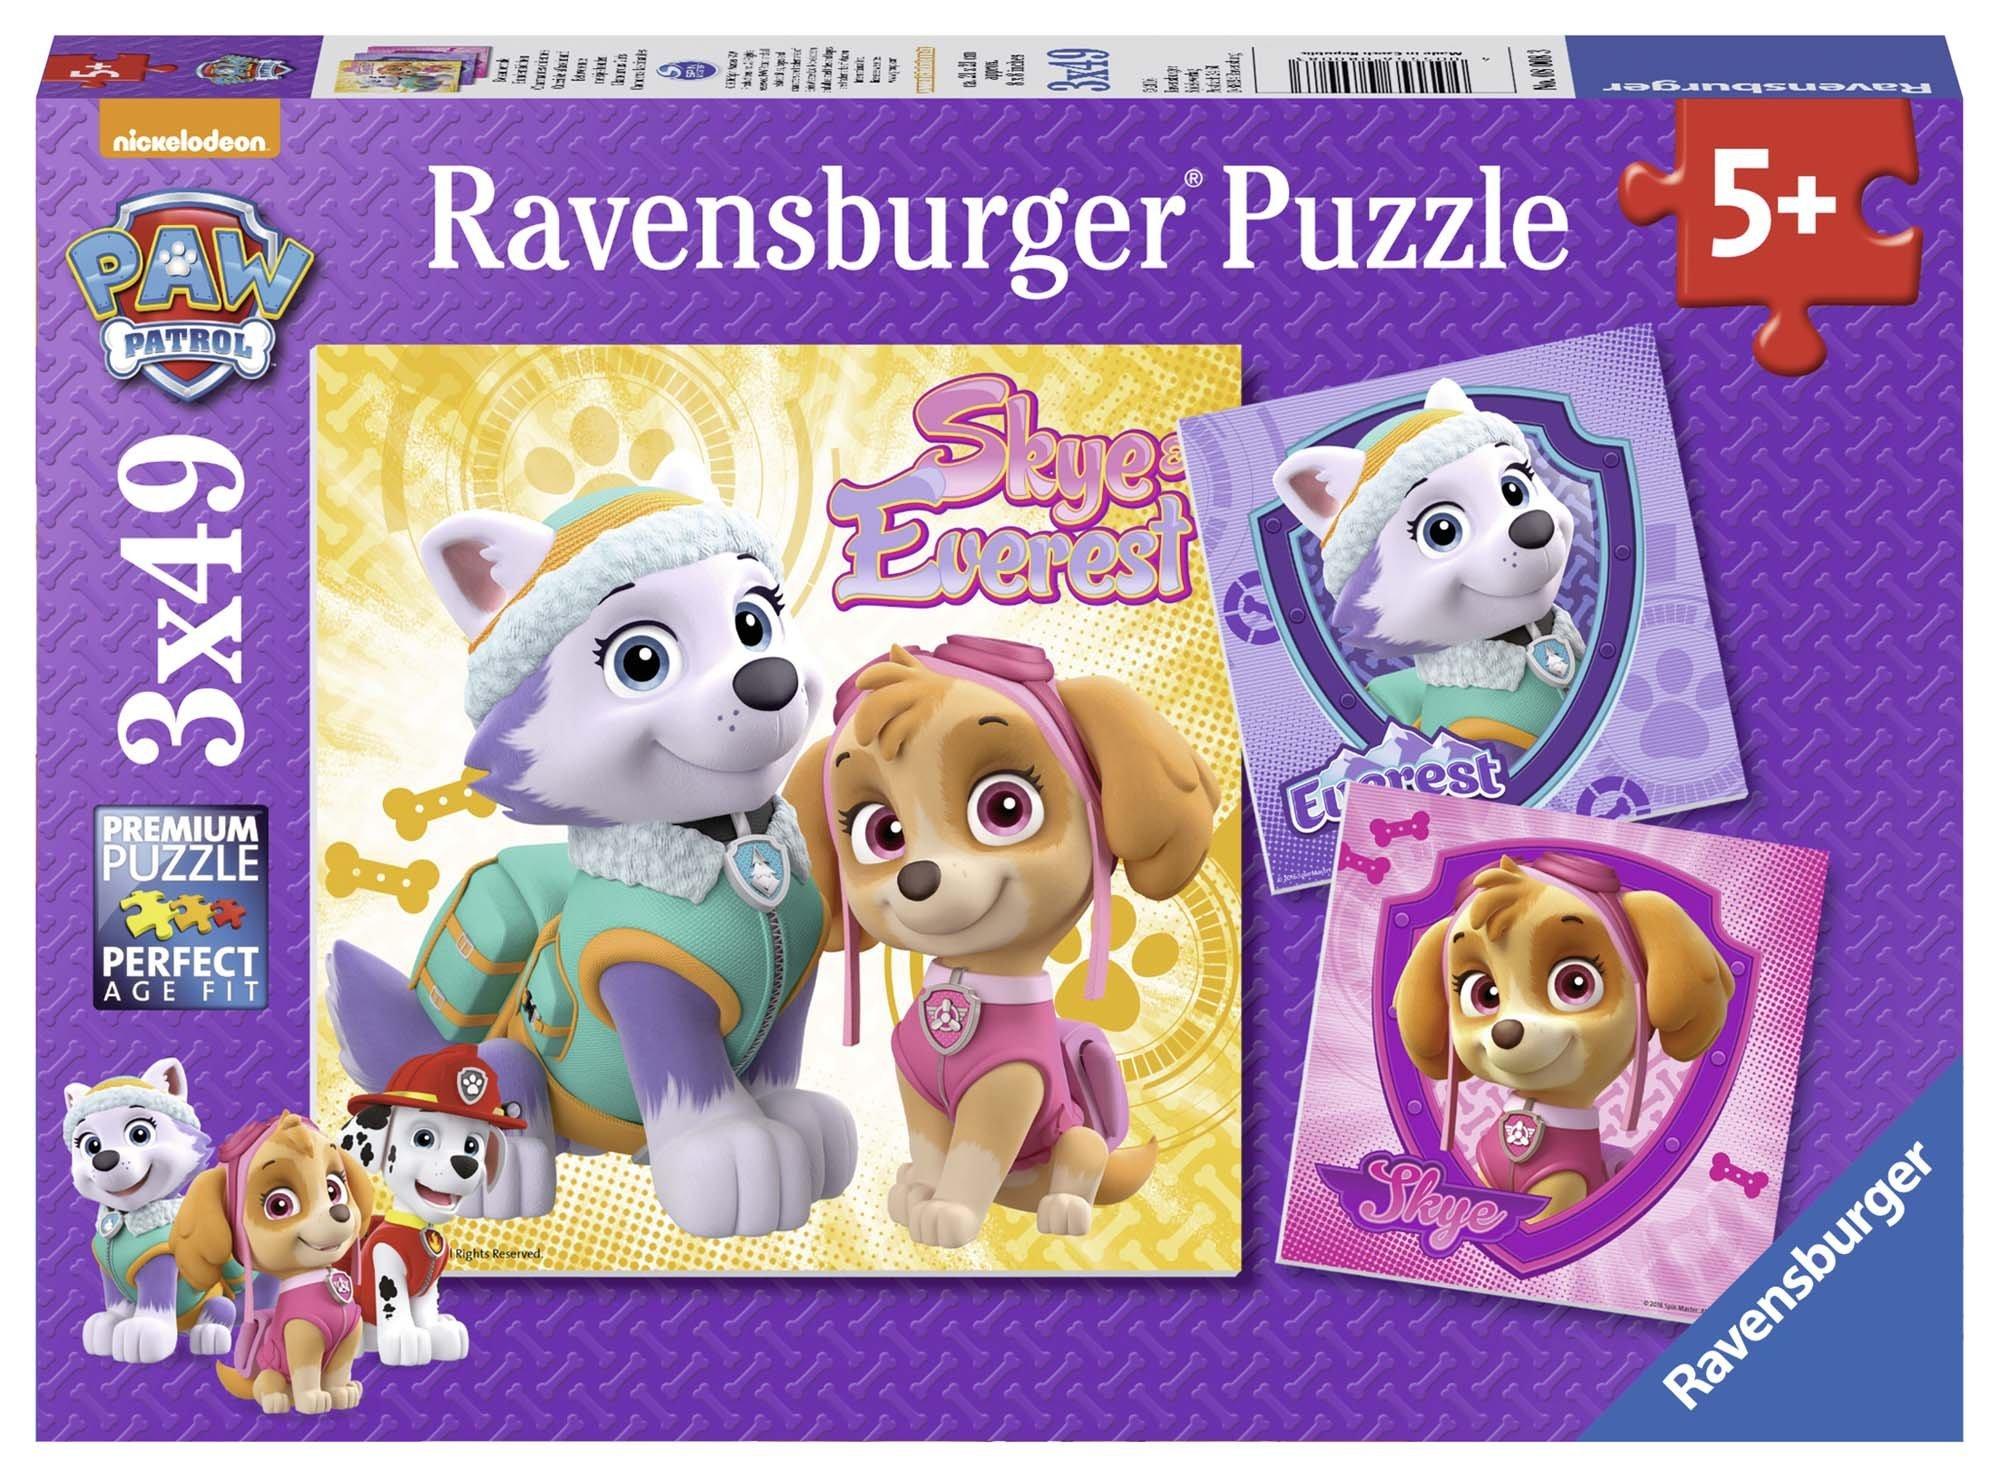 Ravensburger 8008 Paw Patrol Skye & Everest Jigsaw Puzzles - 3 x 49 Pieces